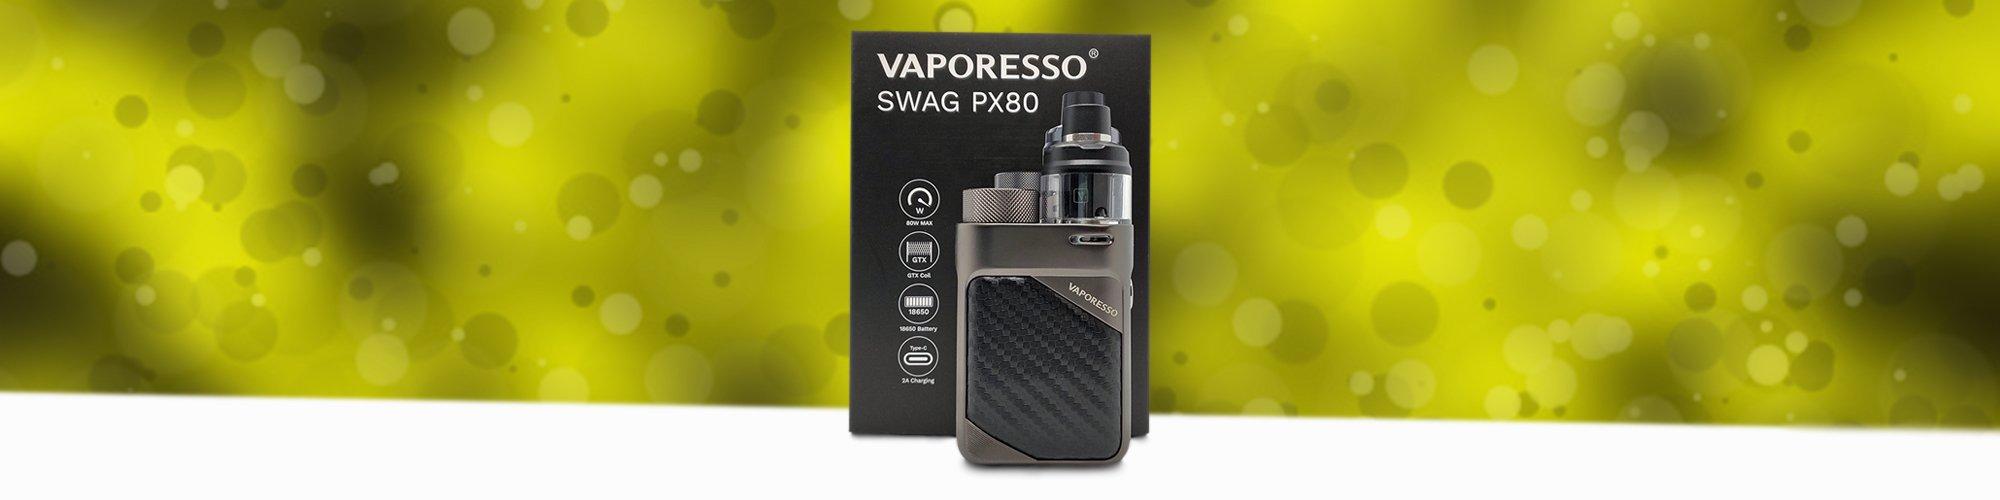 Vaporesso Swag PX80 Pod Mod Review Main Banner